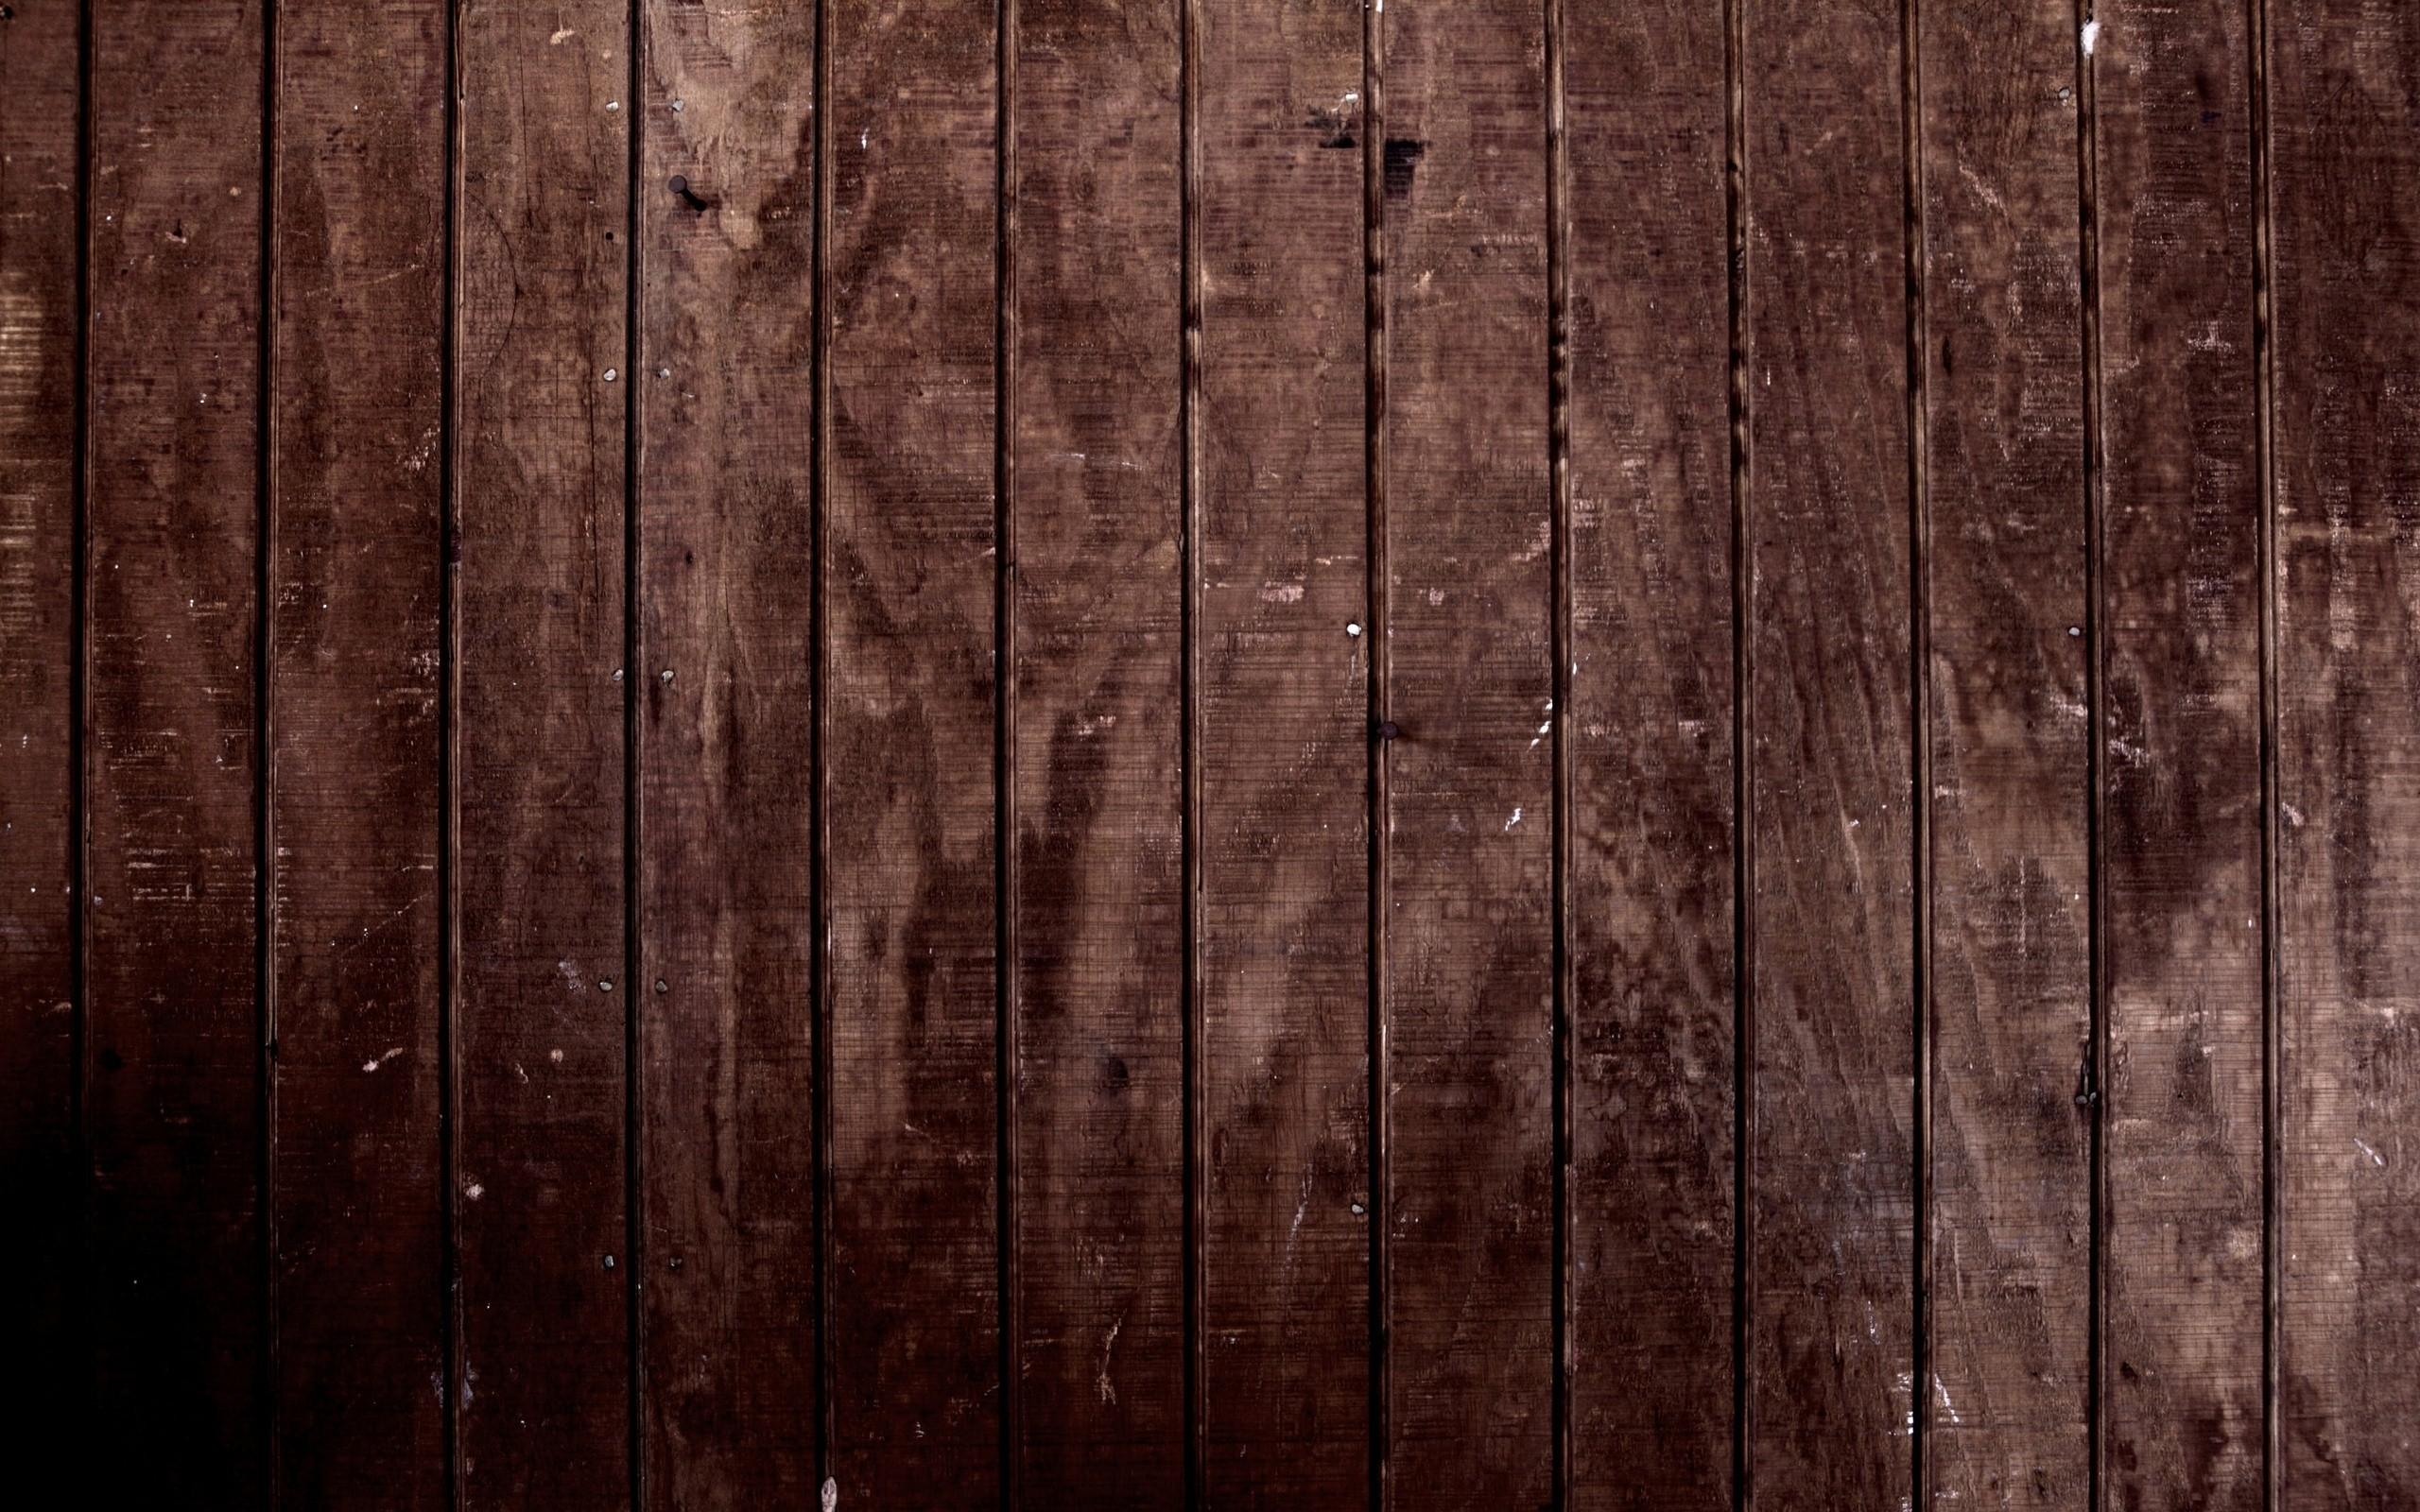 Dark Rustic Wood Background